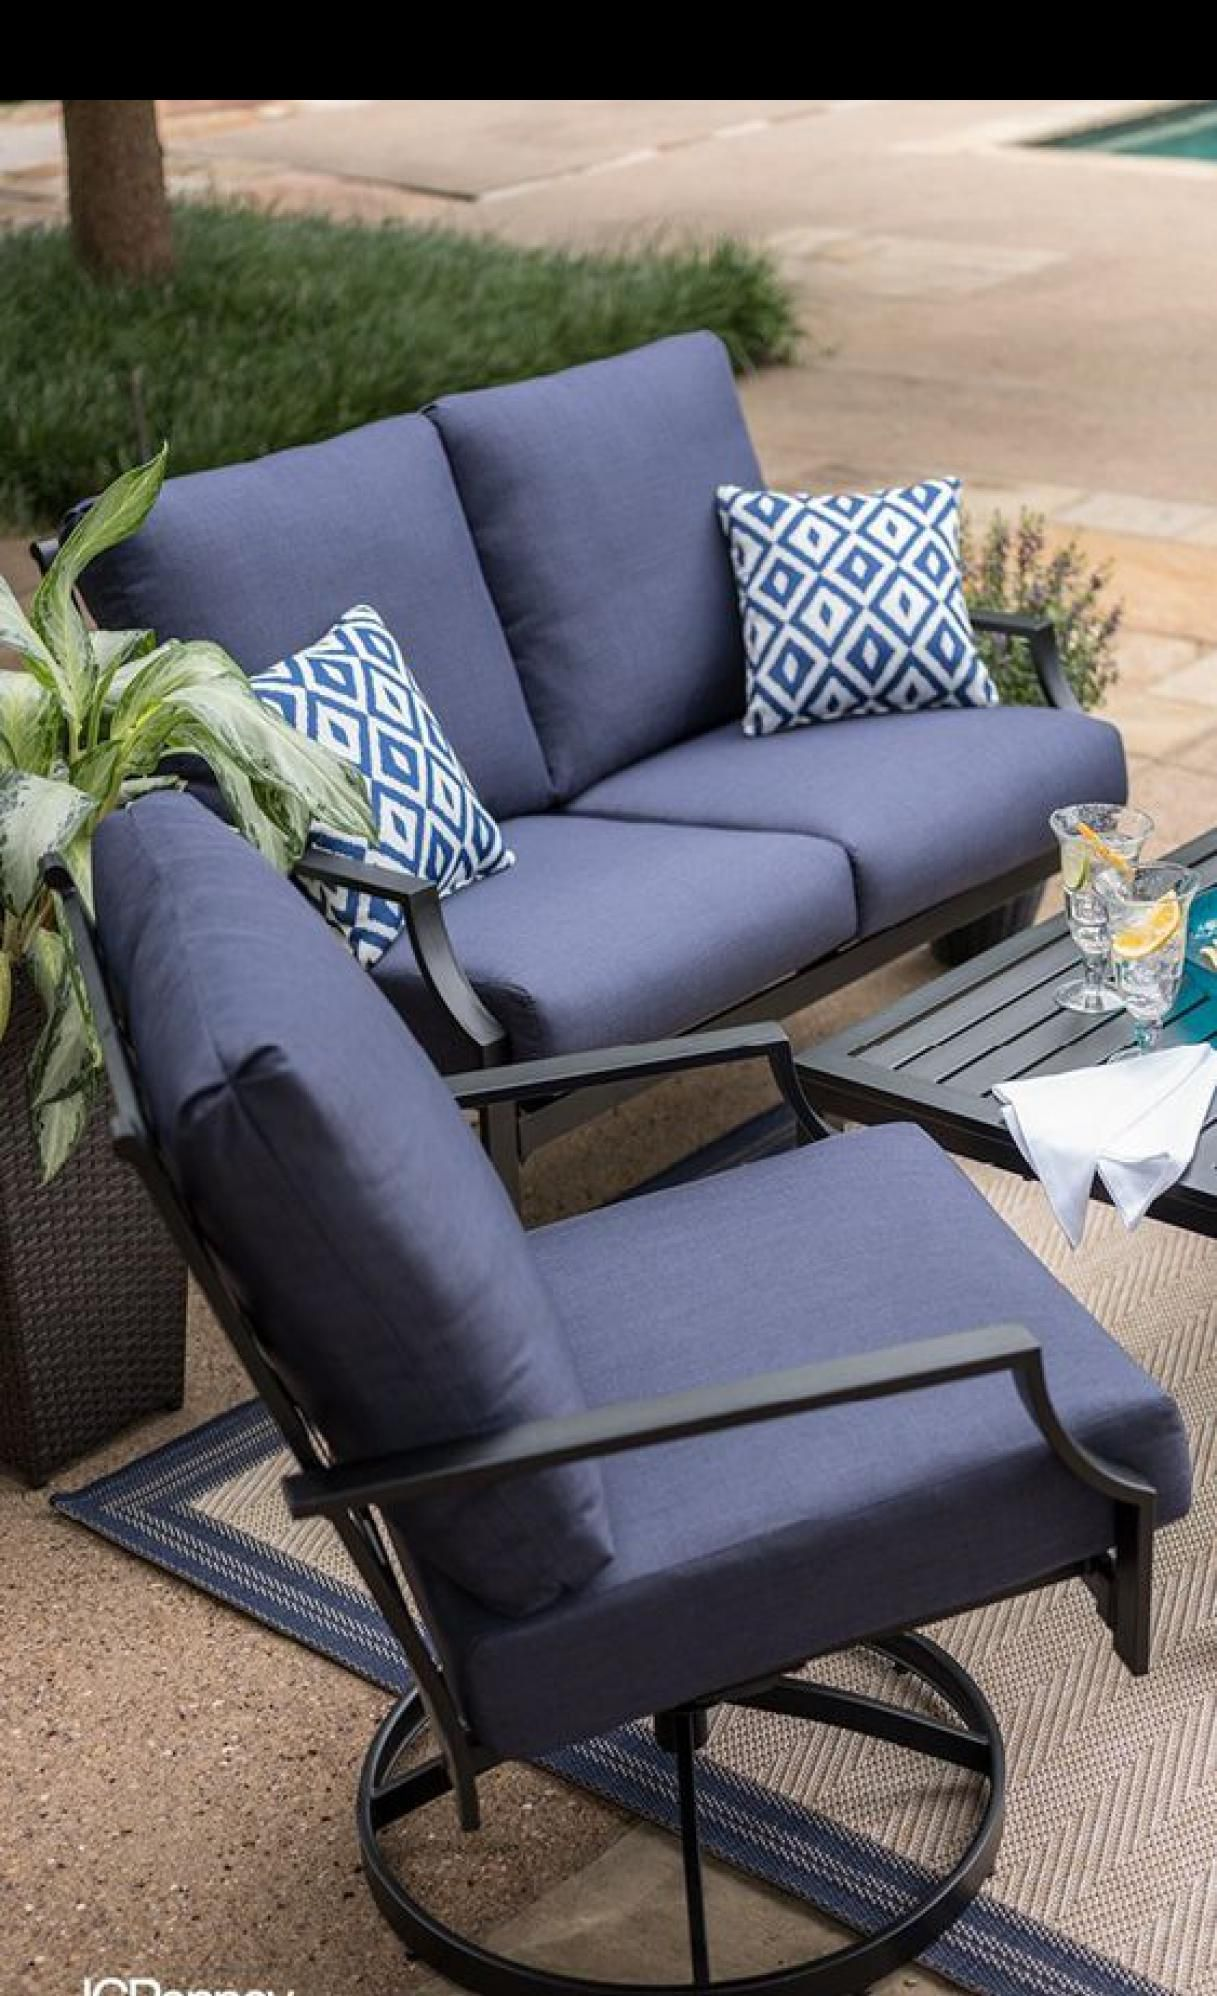 Tumblr In 2020 Diy Garden Furniture Patio Furniture Sets Garden Furniture Design